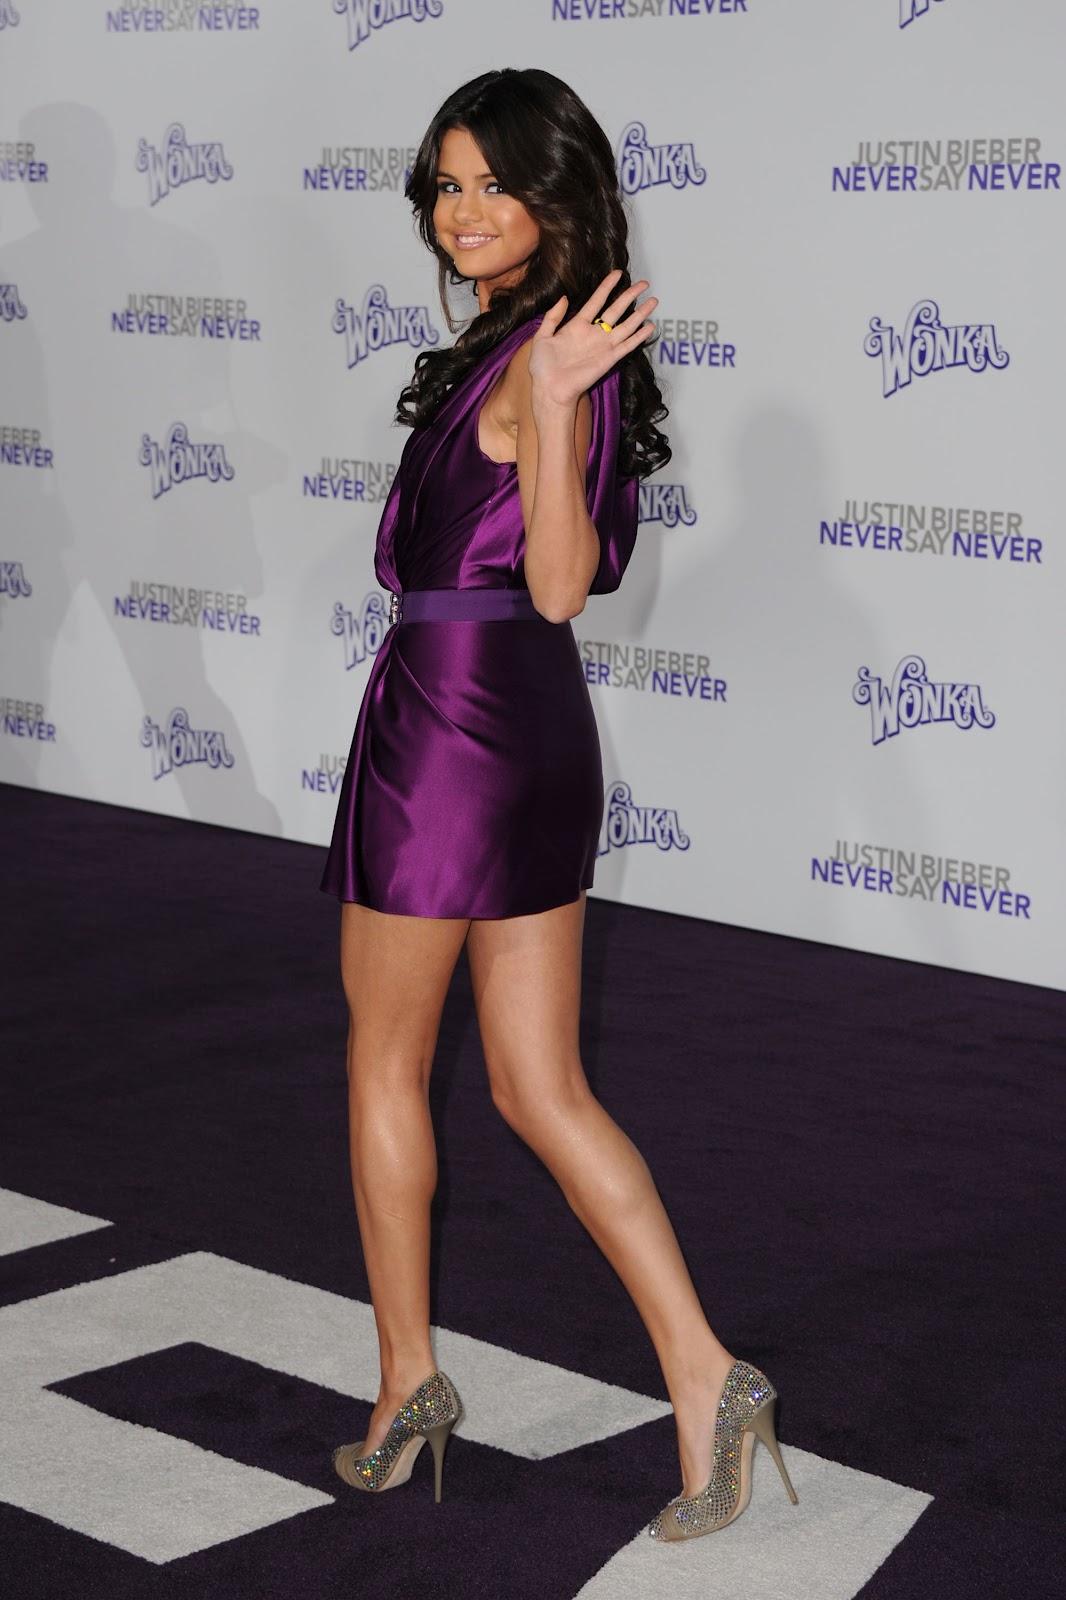 Selena Gomezs Legs And Feet-23 Sexiest Celebrity Legs And Feet